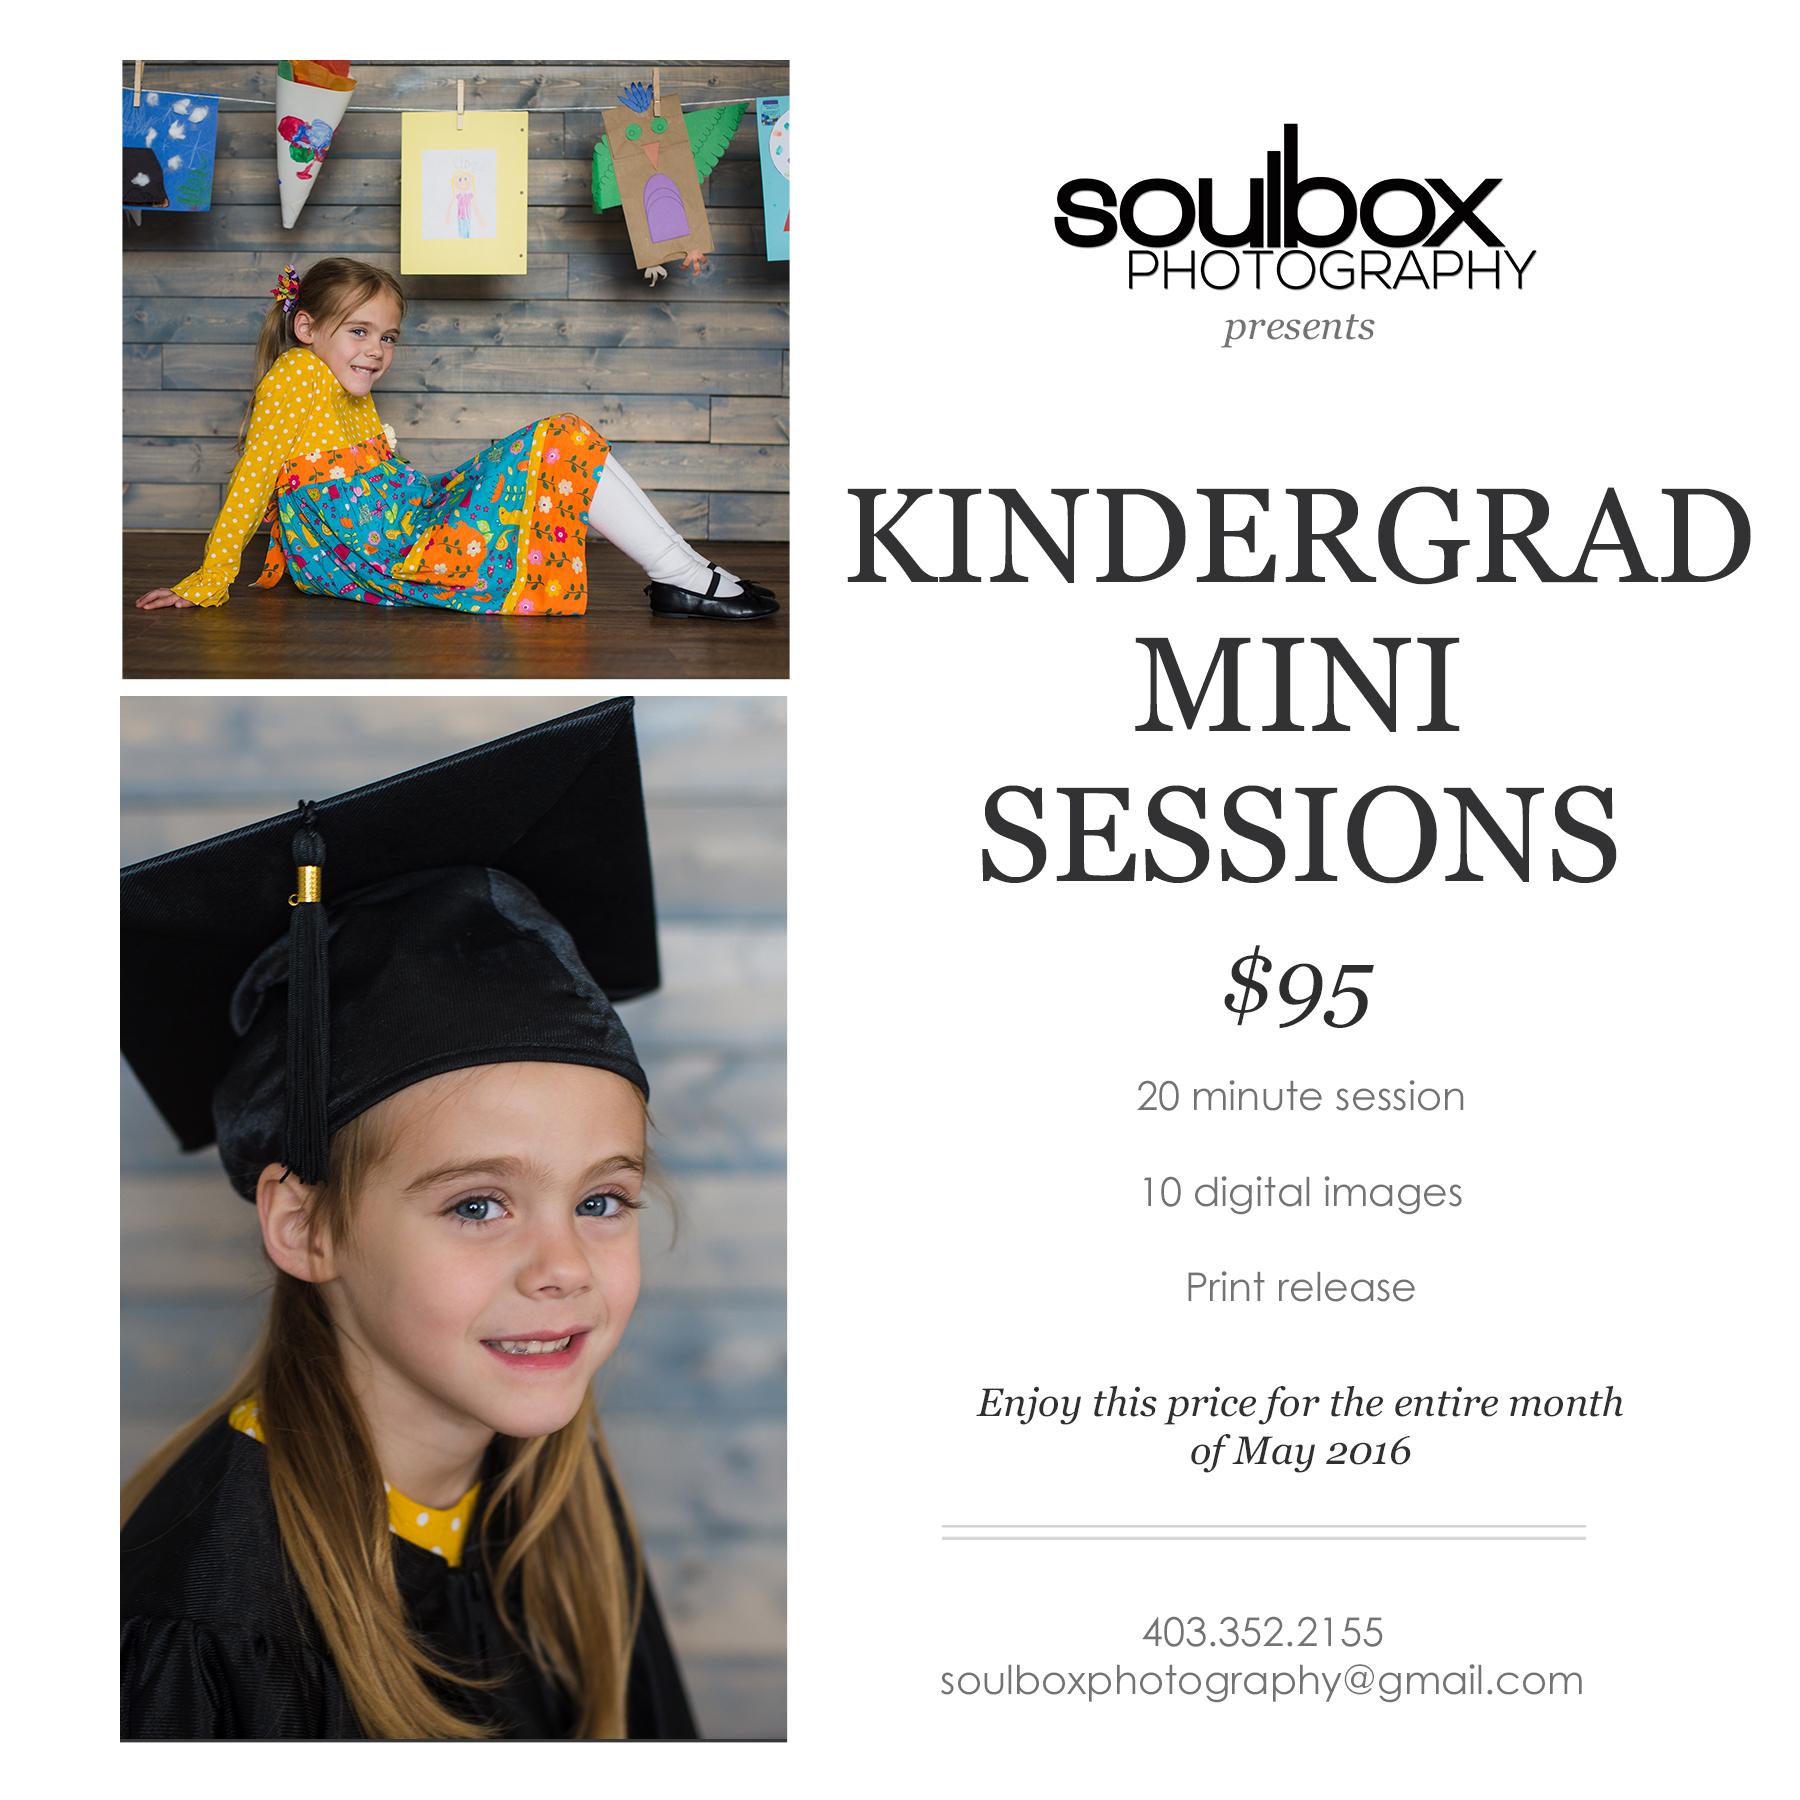 SoulboxPhotographyKindergradMiniSessions